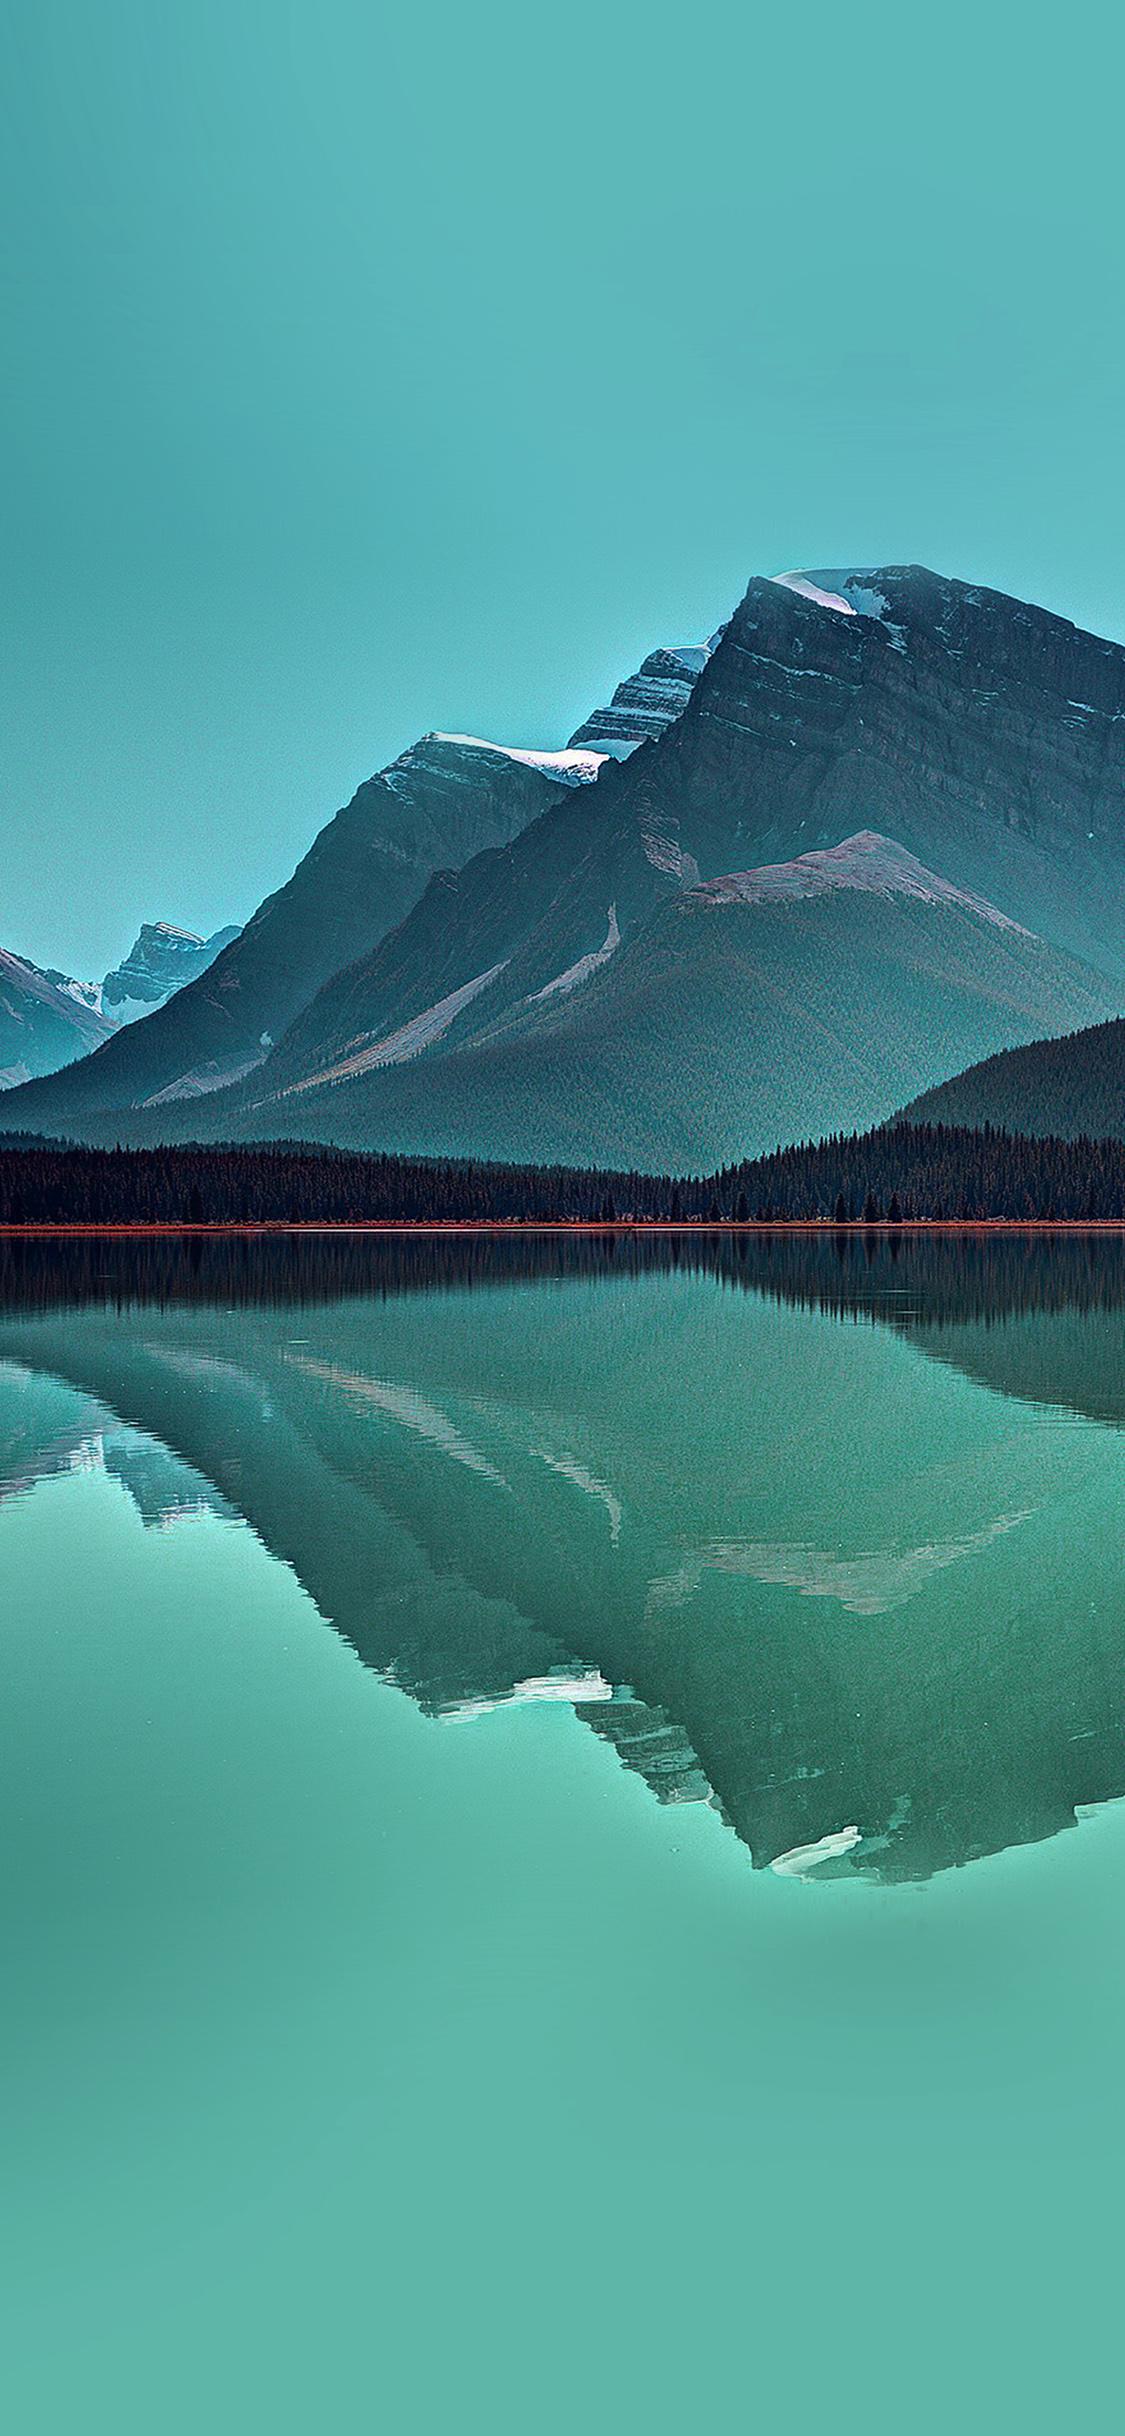 Iphonexpapers Com Iphone X Wallpaper Ne74 Lake Mountain Reflection Nature Green